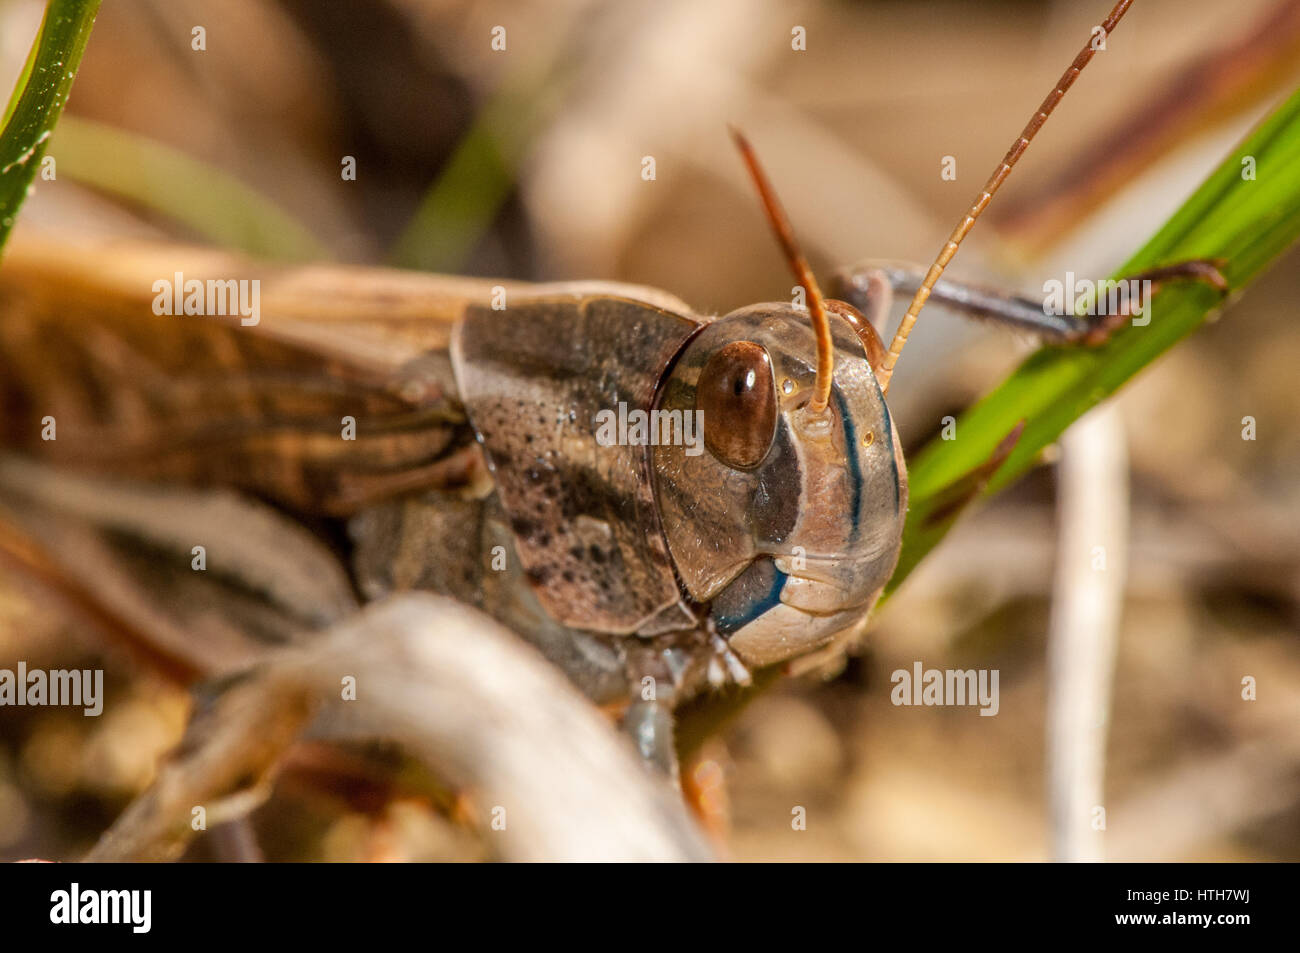 Nahaufnahme eines Insekts (Locusta Migratoria Cinerascens) Stockbild